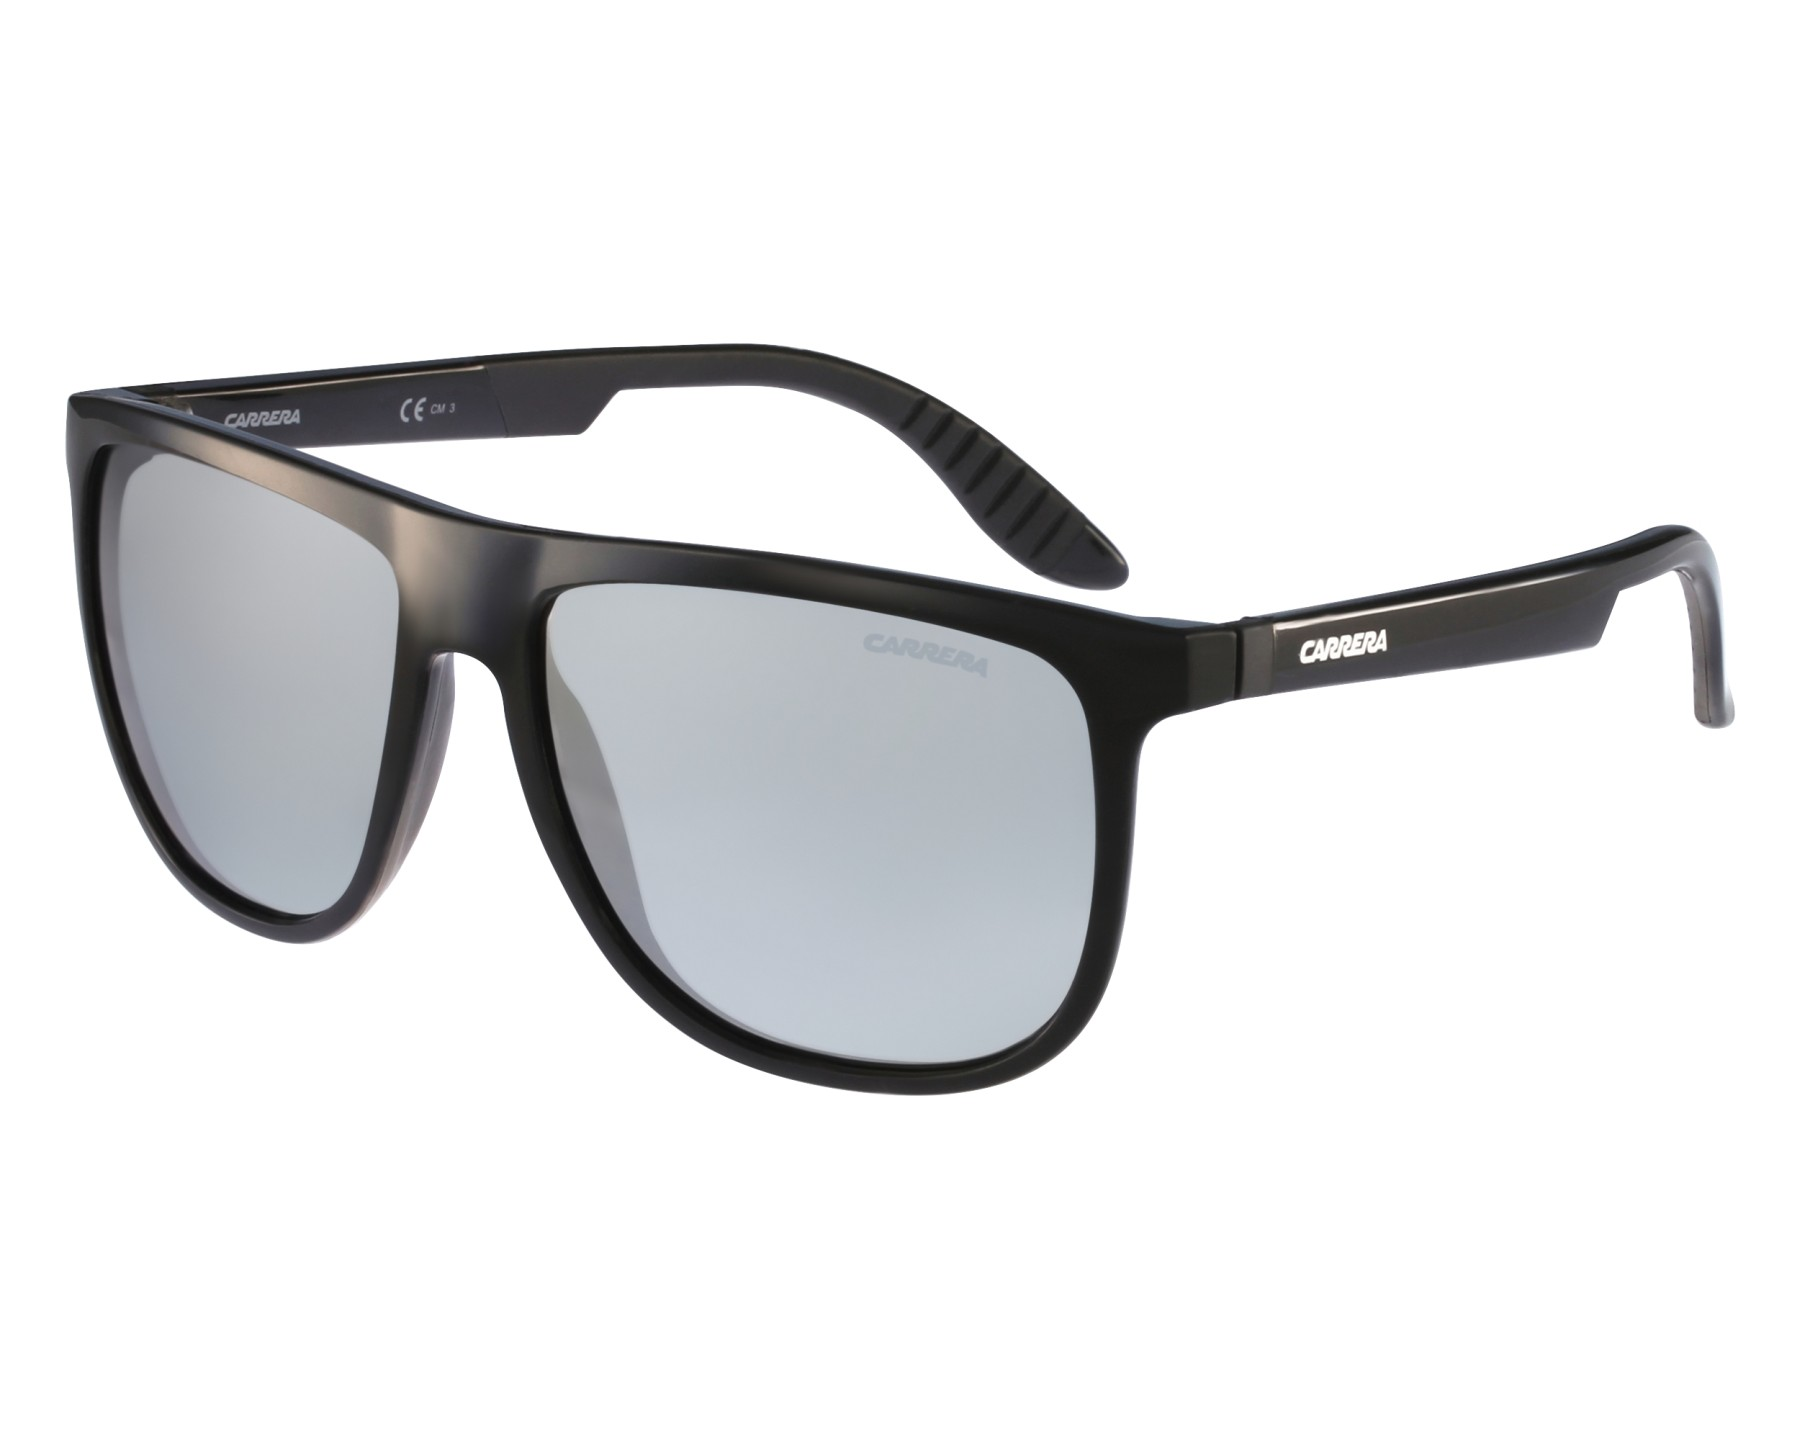 3fec40d3c7058 Lunettes de soleil Carrera 5003-SP I6V 3R - Noir vue de face